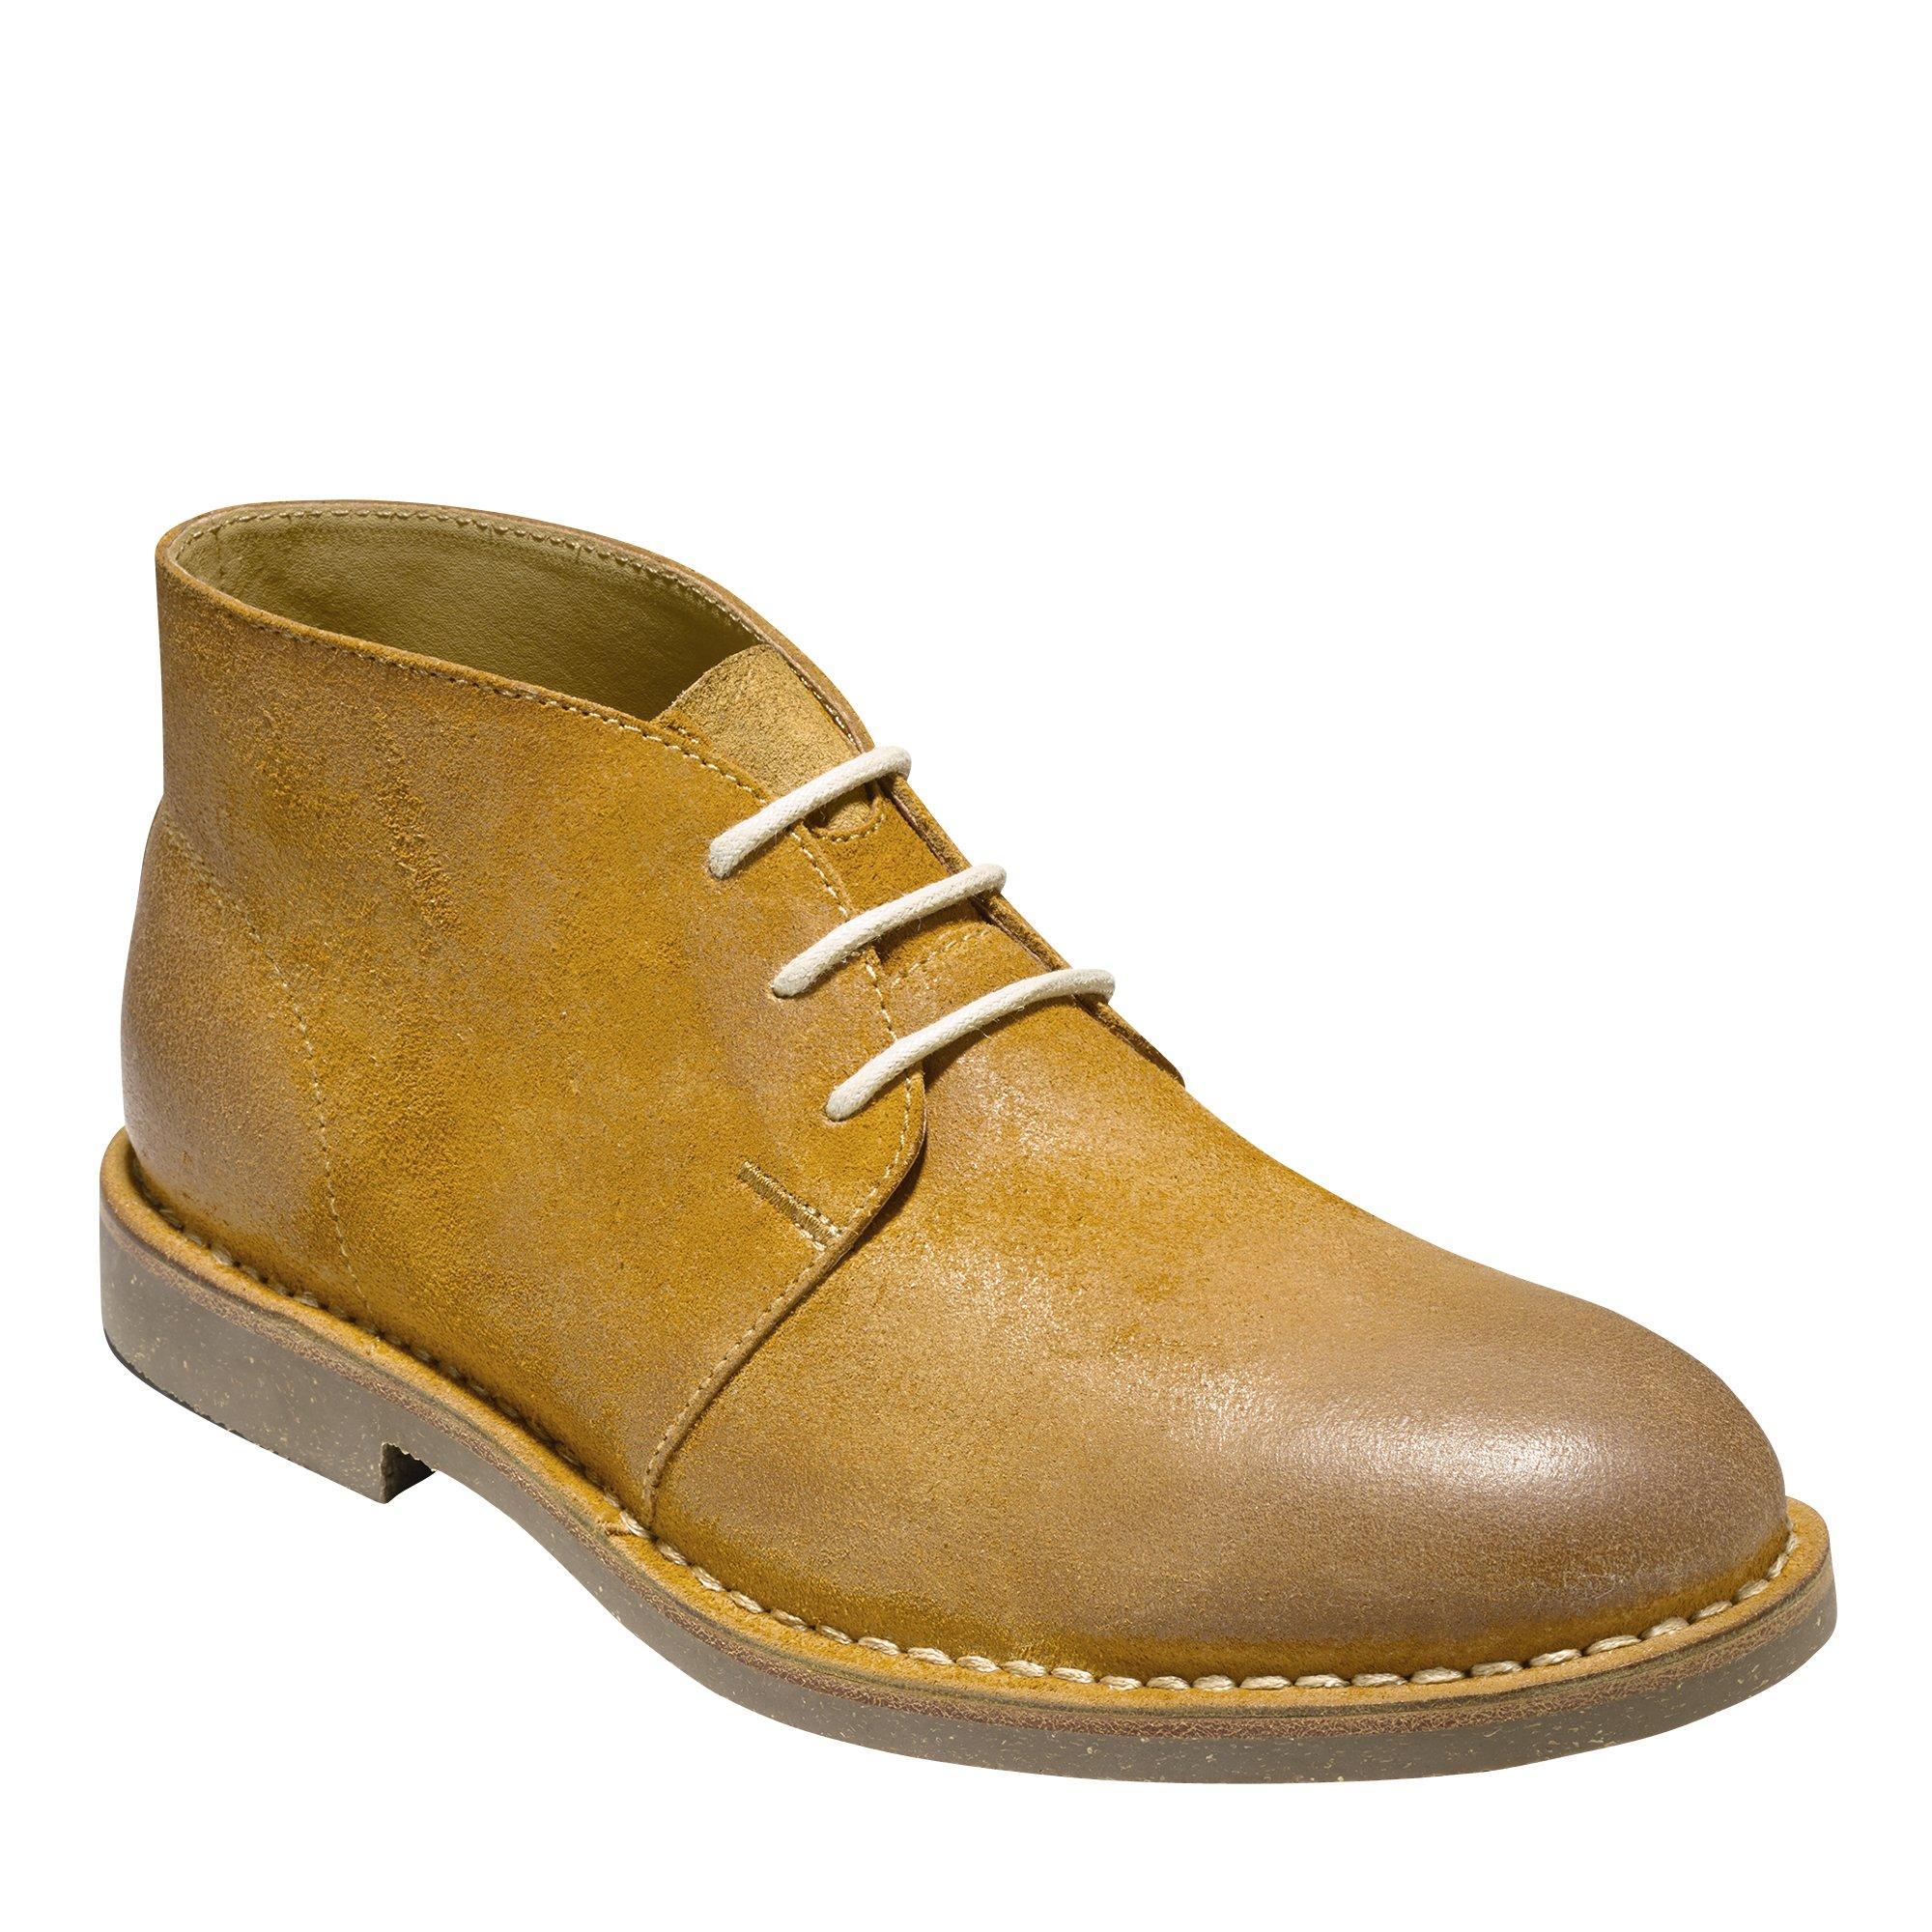 72b30f3755 Cole Haan Men's C14466 - Glenn Chukka Boot - The Shoe Mart